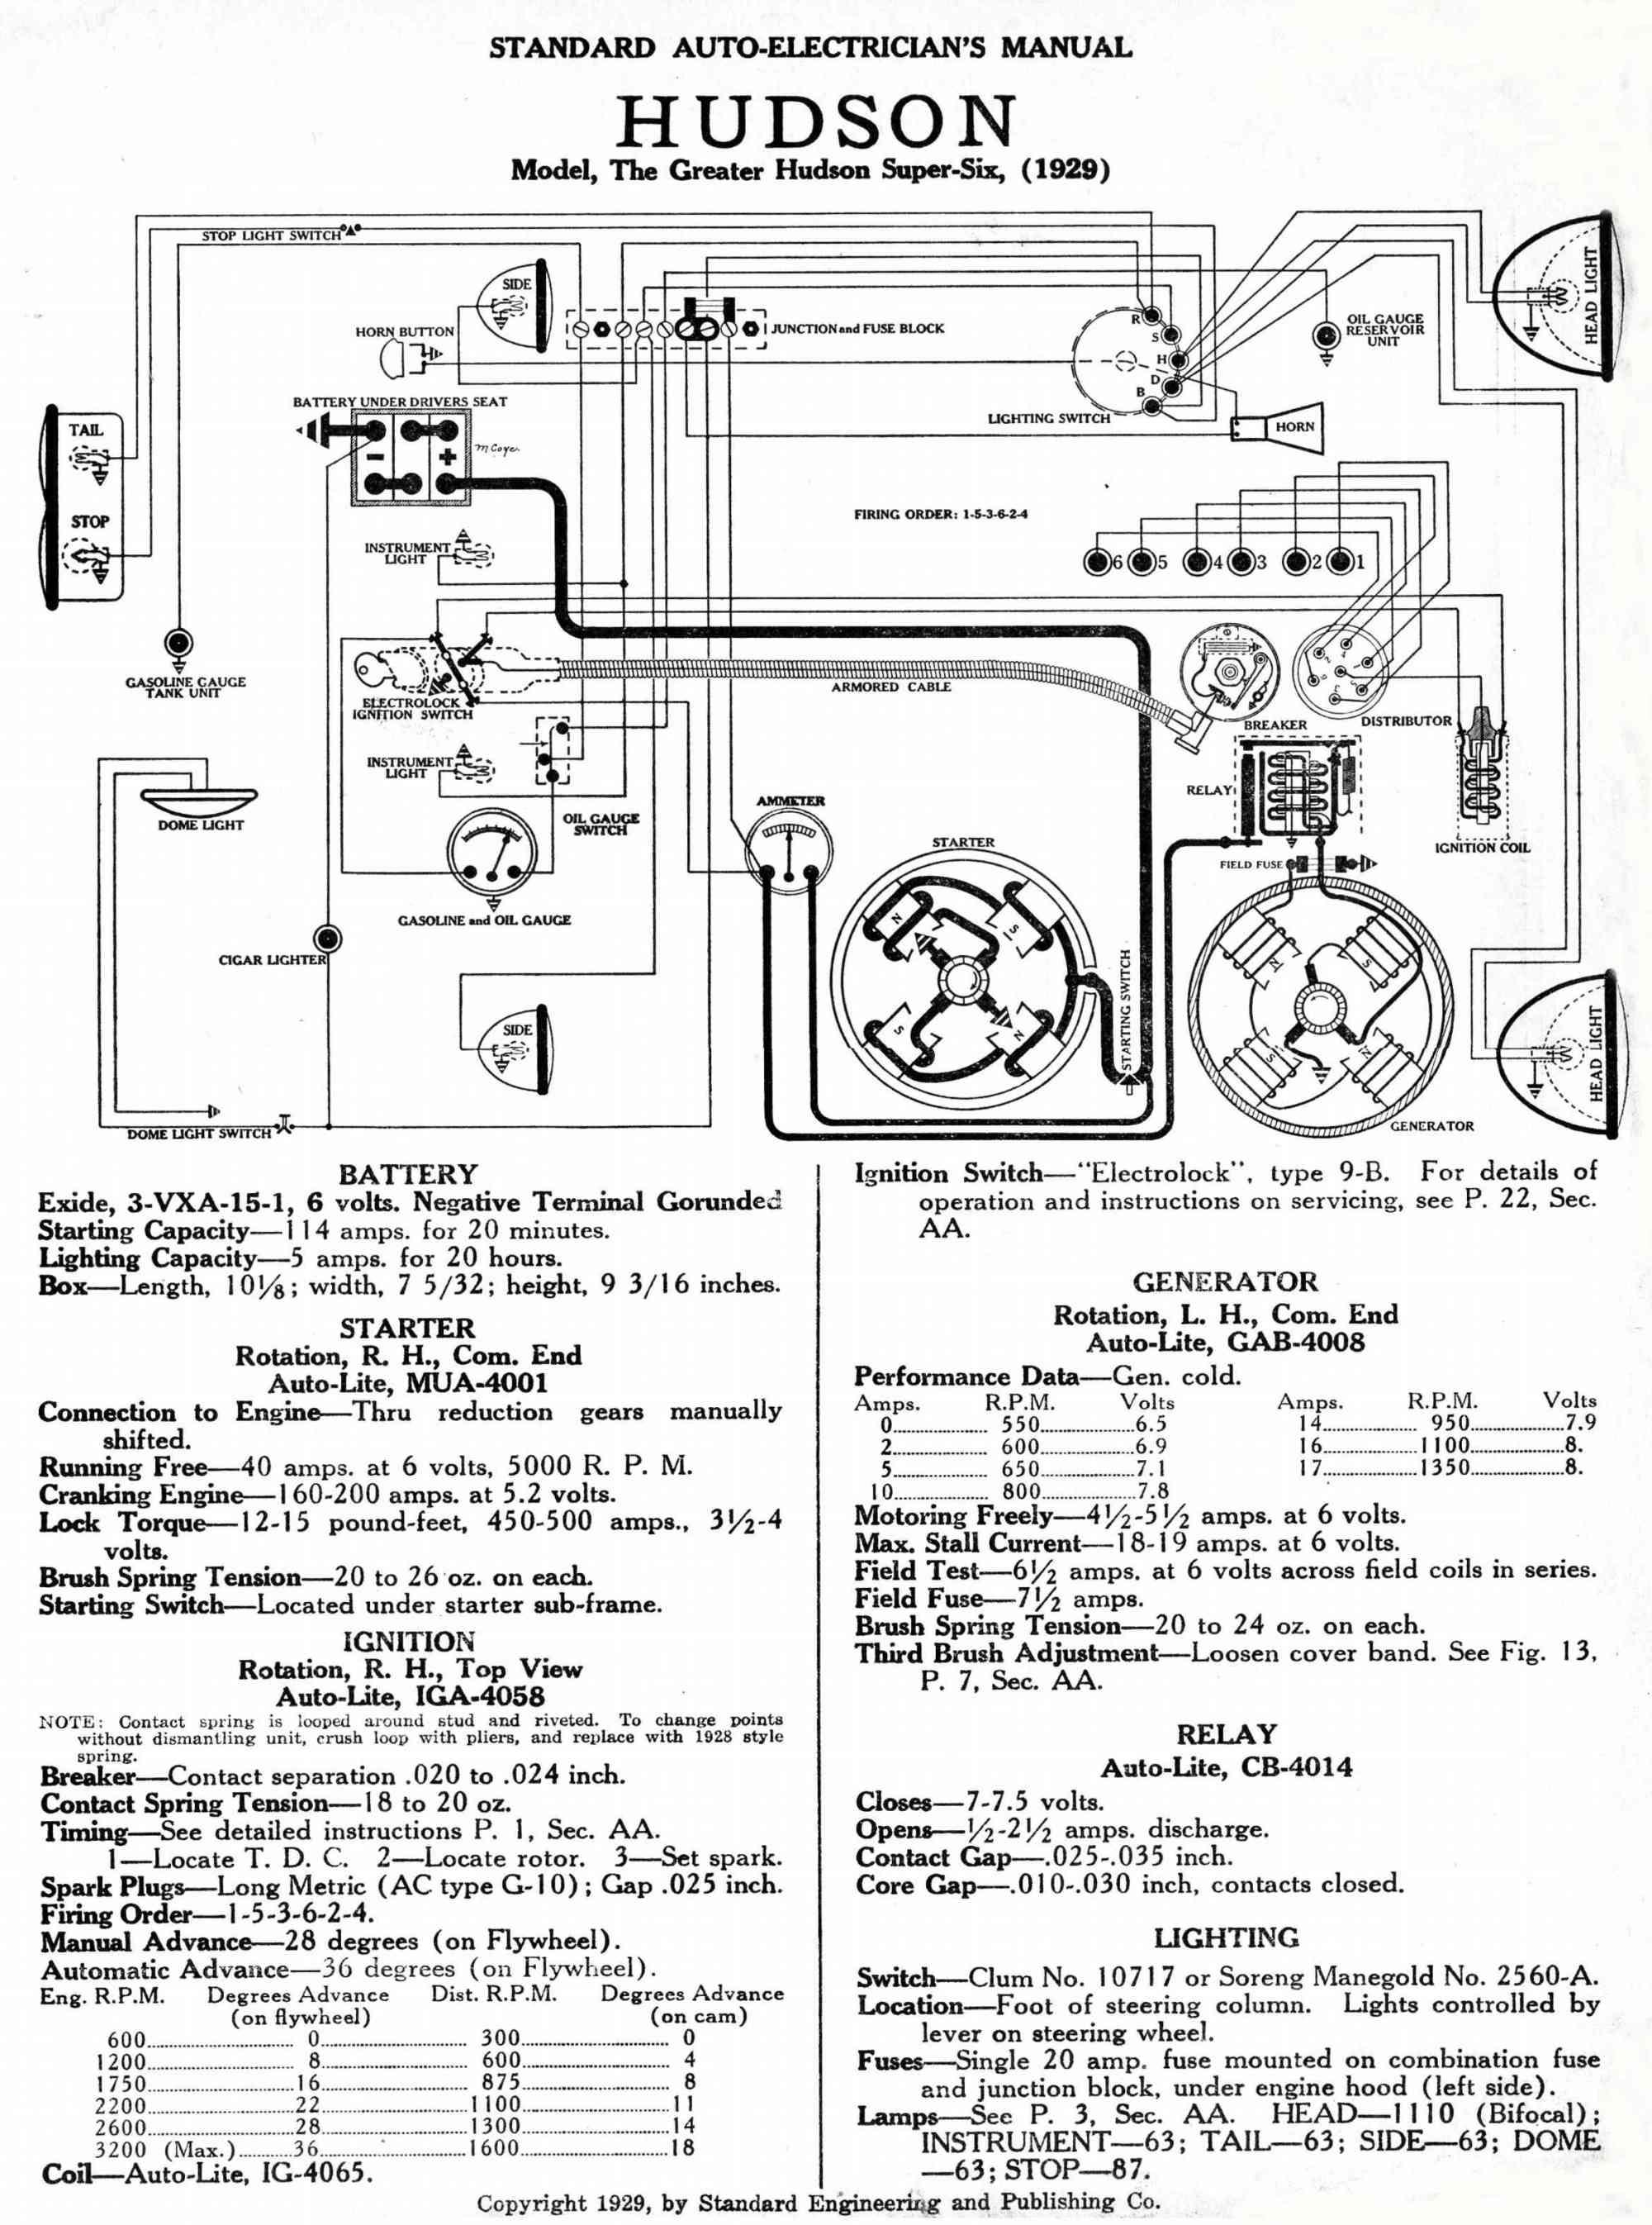 hight resolution of 1950 hudson wiring diagram wiring diagrams long 1947 hudson wiring harness